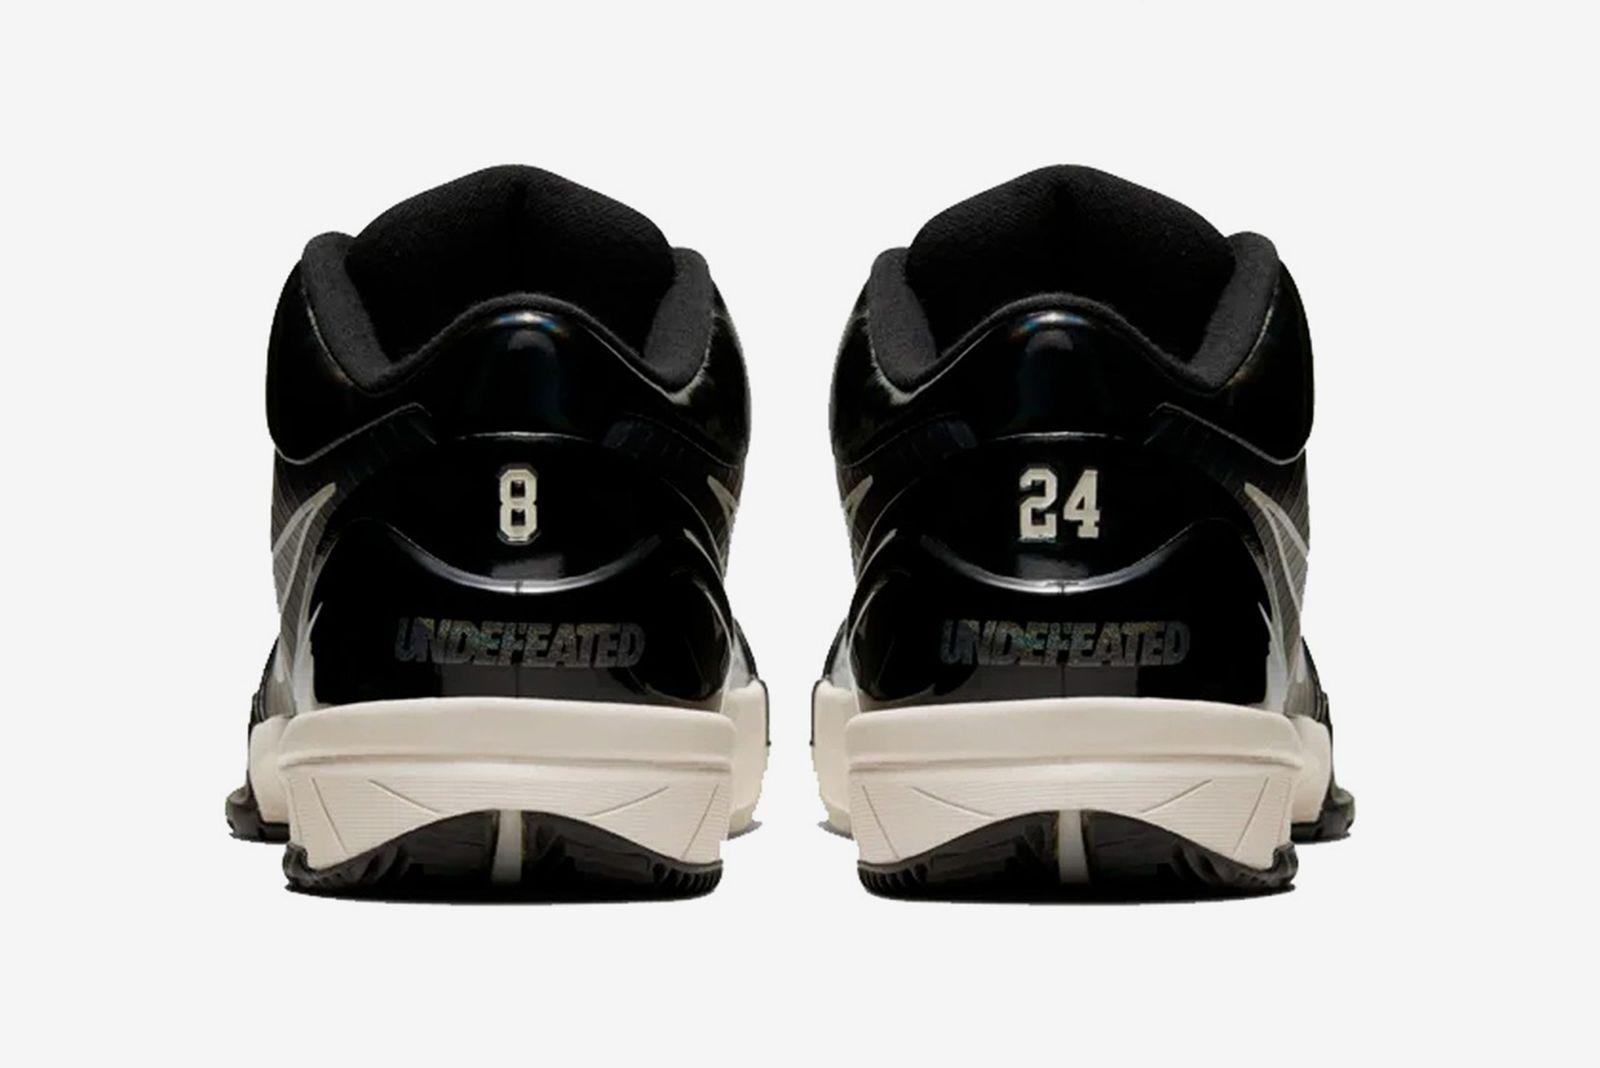 undefeated nike kobe 4 protro black mamba release date price Kobe Bryant